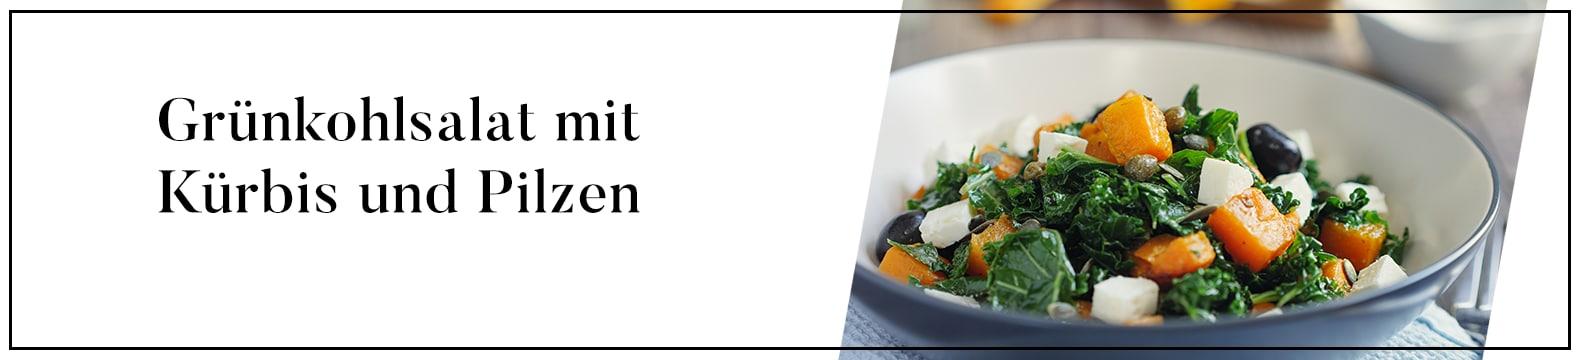 Grünkohlsalat mit Kürbis und Pilzen